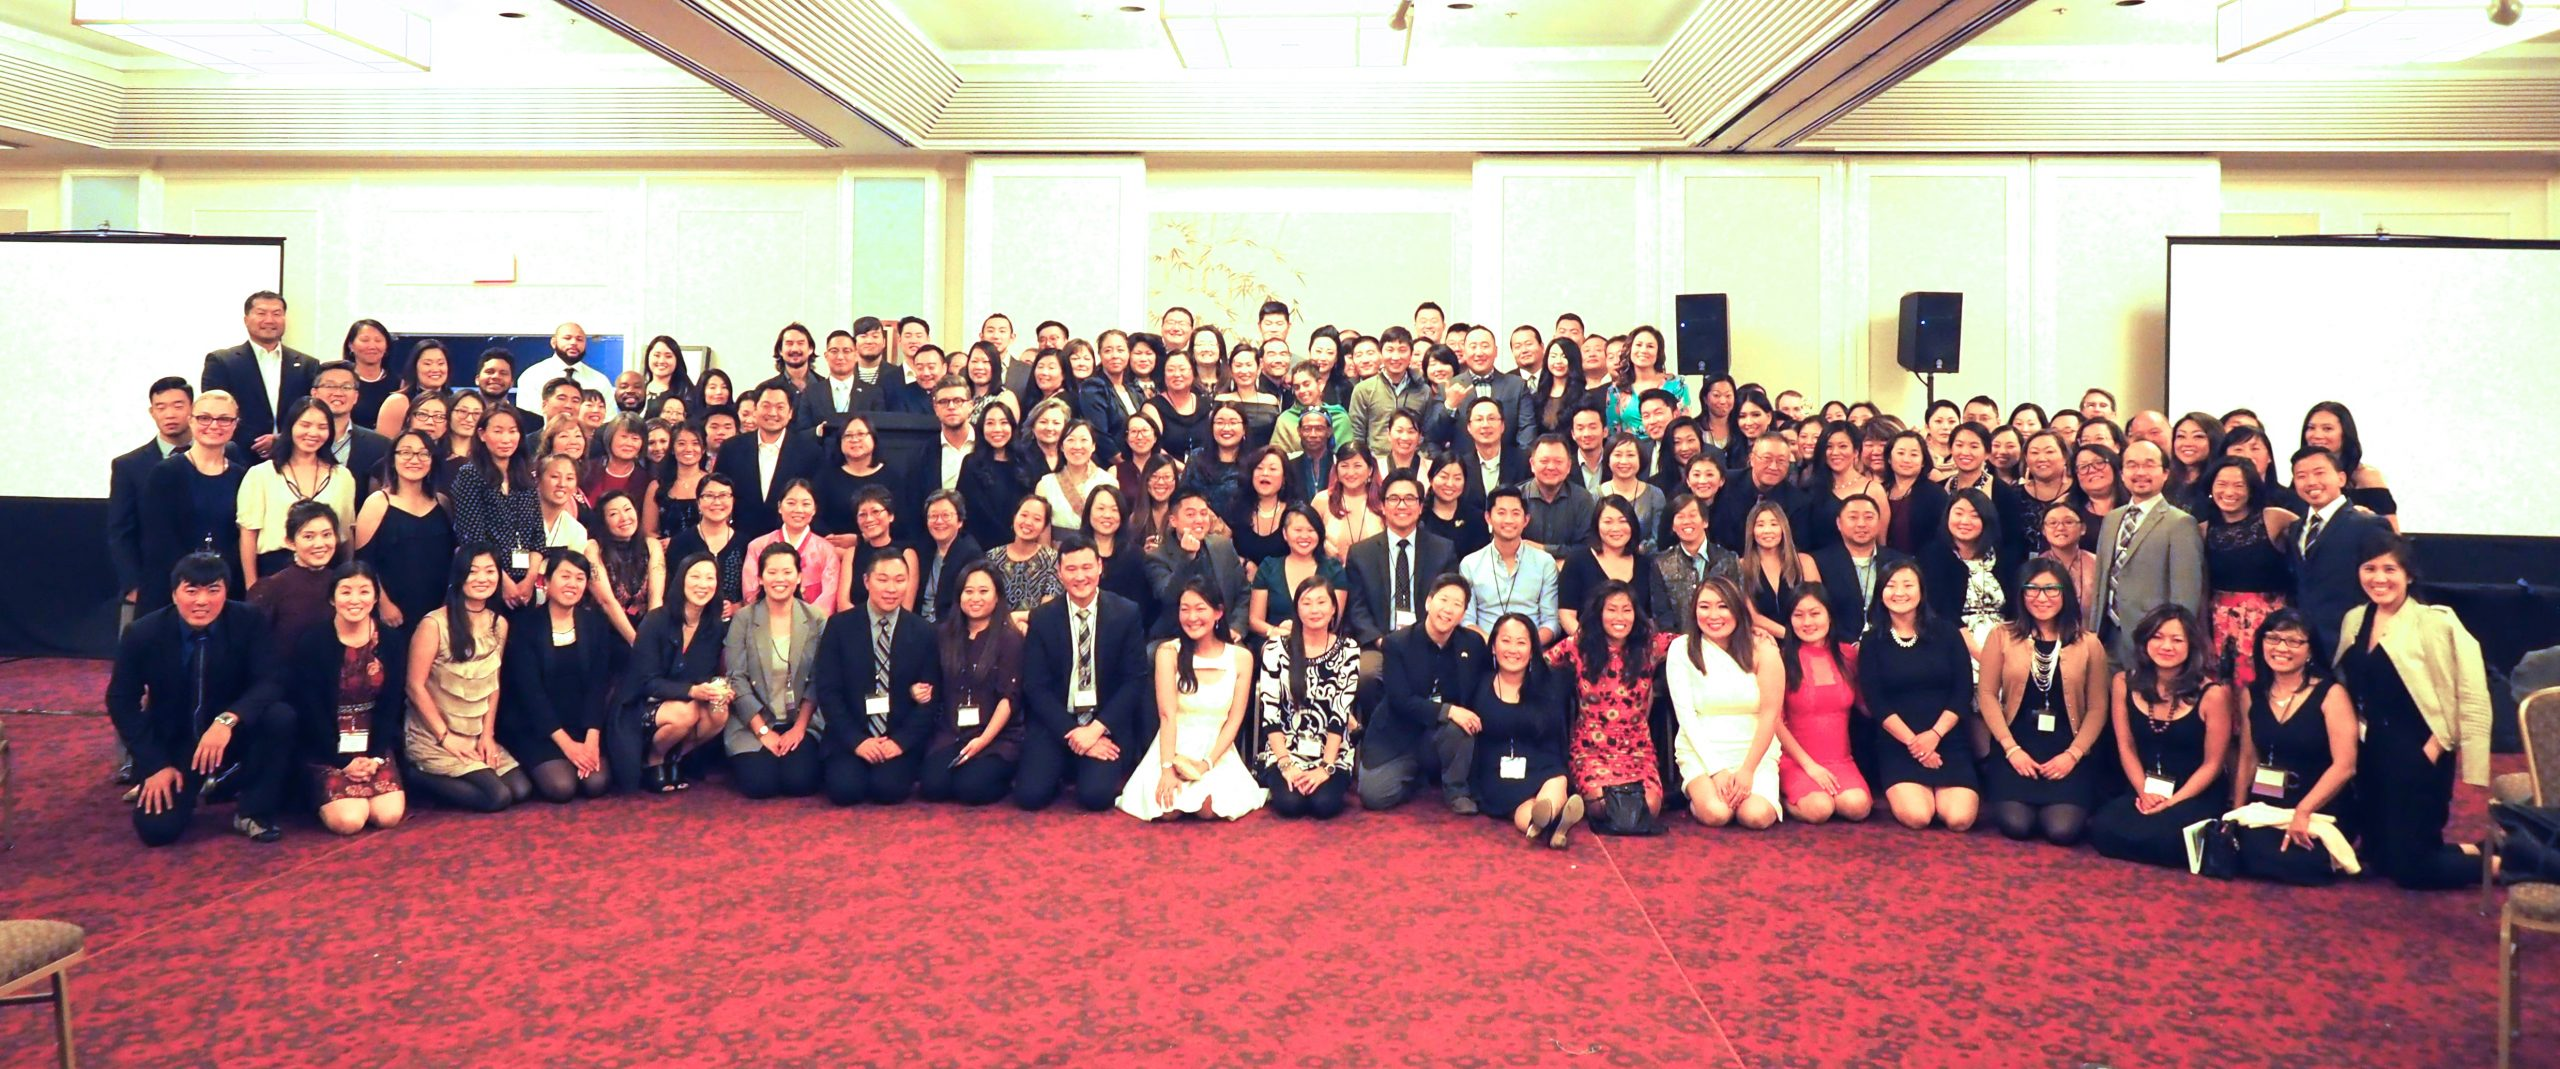 2017 San Francisco 20th Anniversary & Gathering